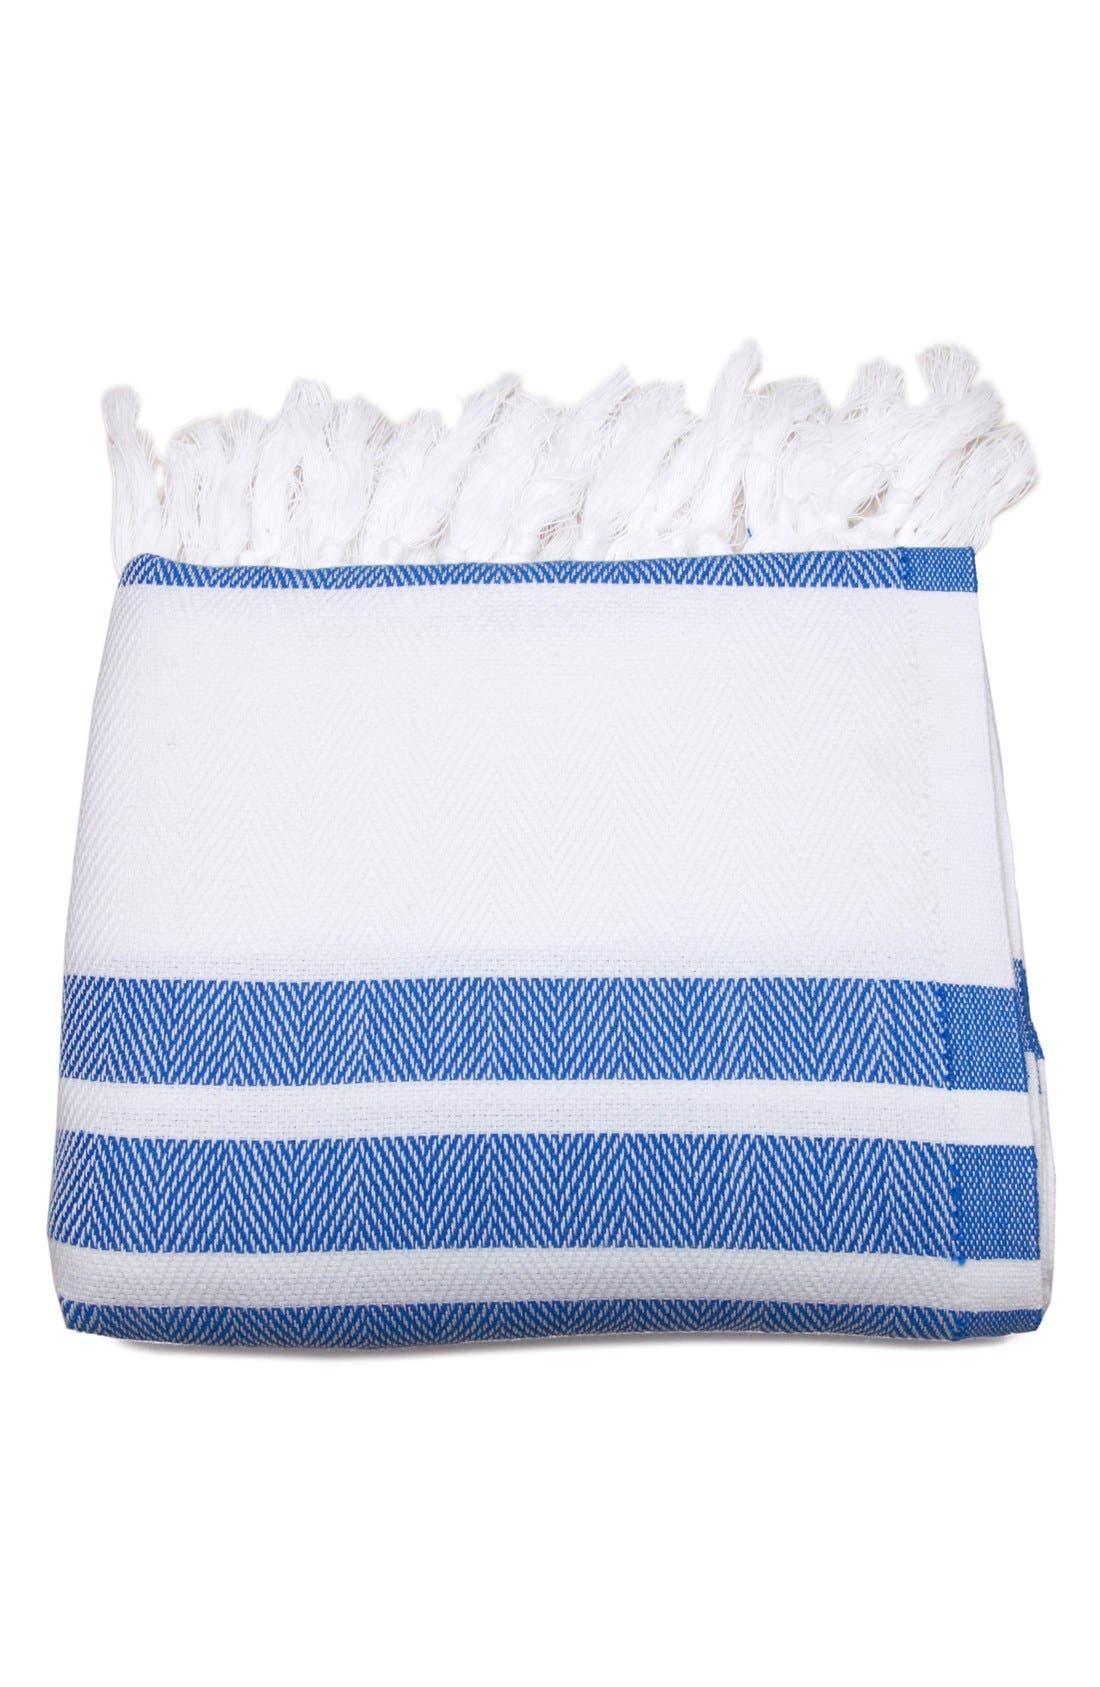 Herringbone Striped Turkish Pestemal Towel,                             Alternate thumbnail 2, color,                             Royal Blue/ White